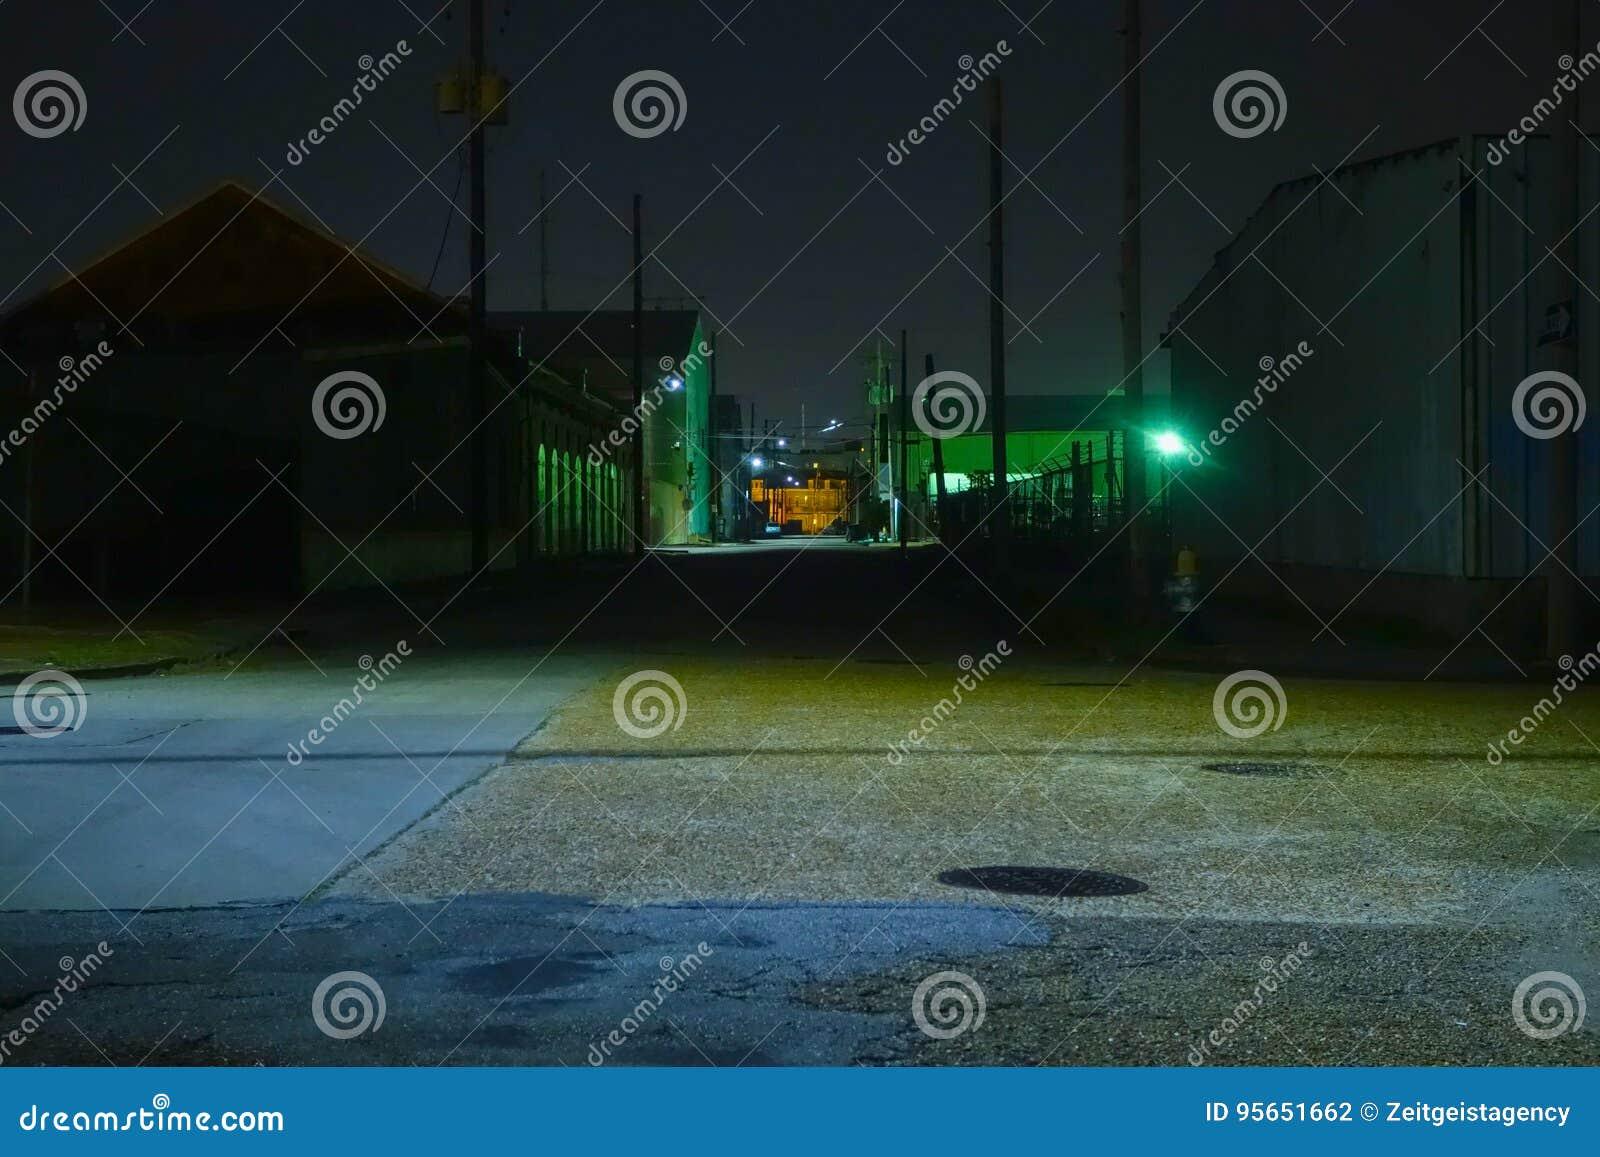 Industriezone bij nacht